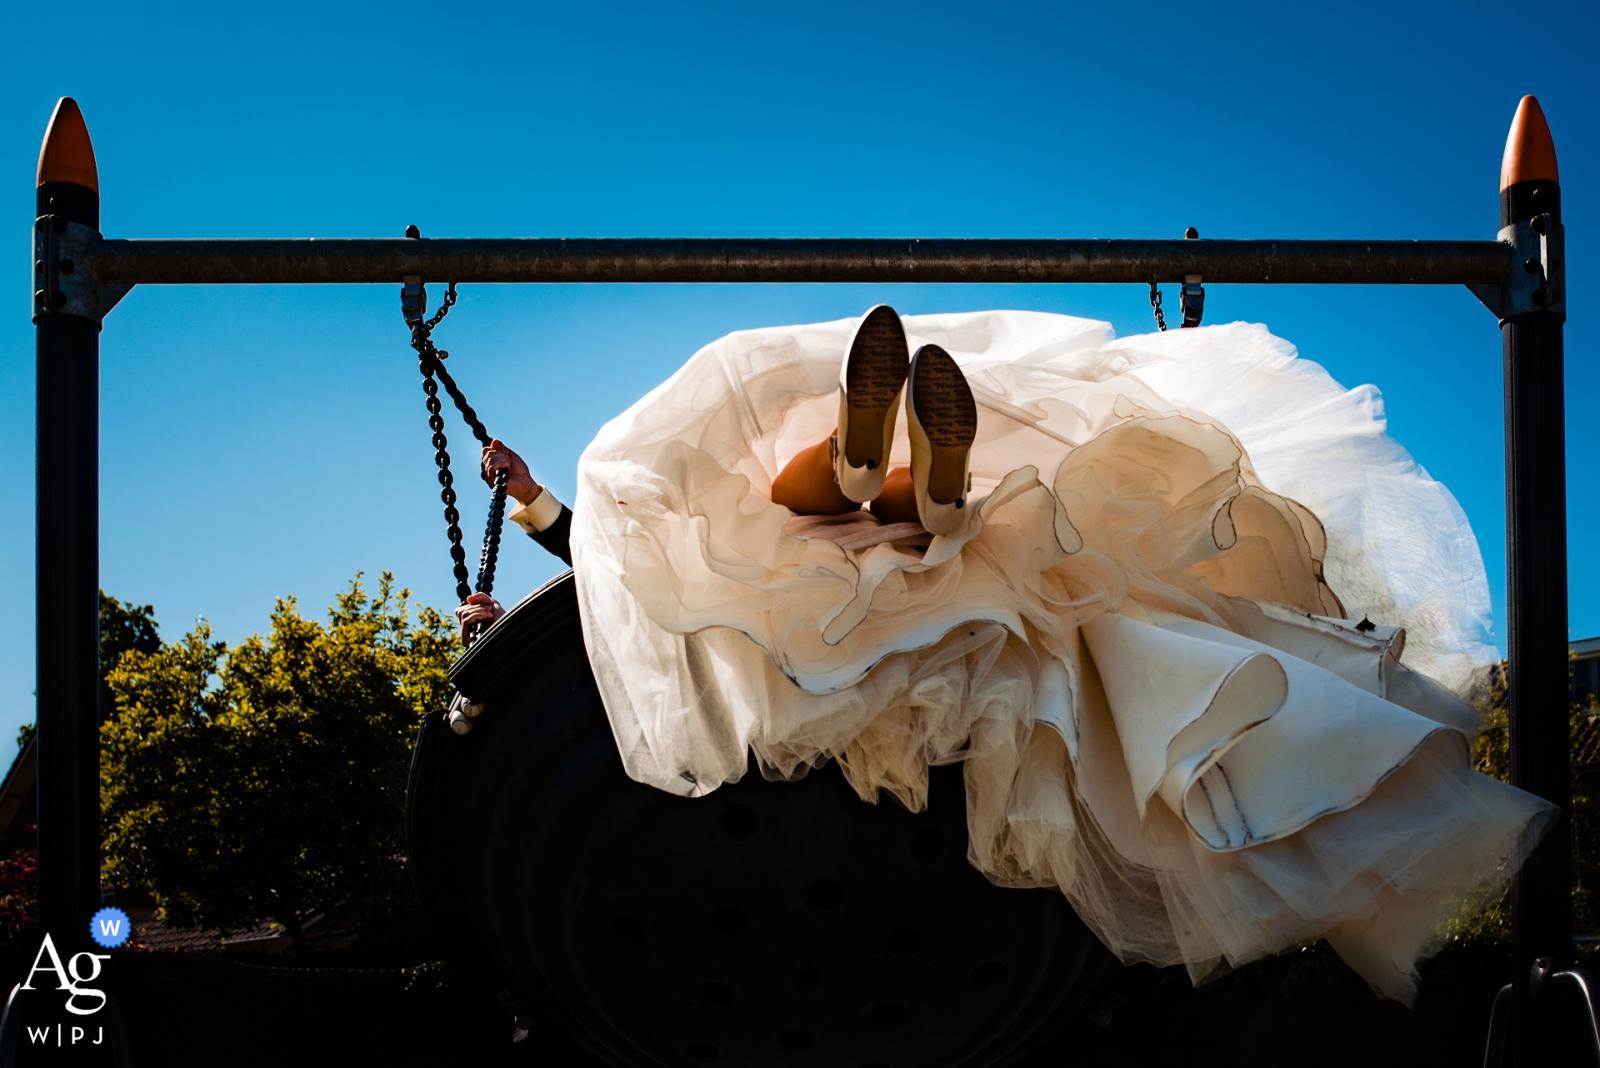 Heusden City artistic wedding Swing along photo against a blue sky